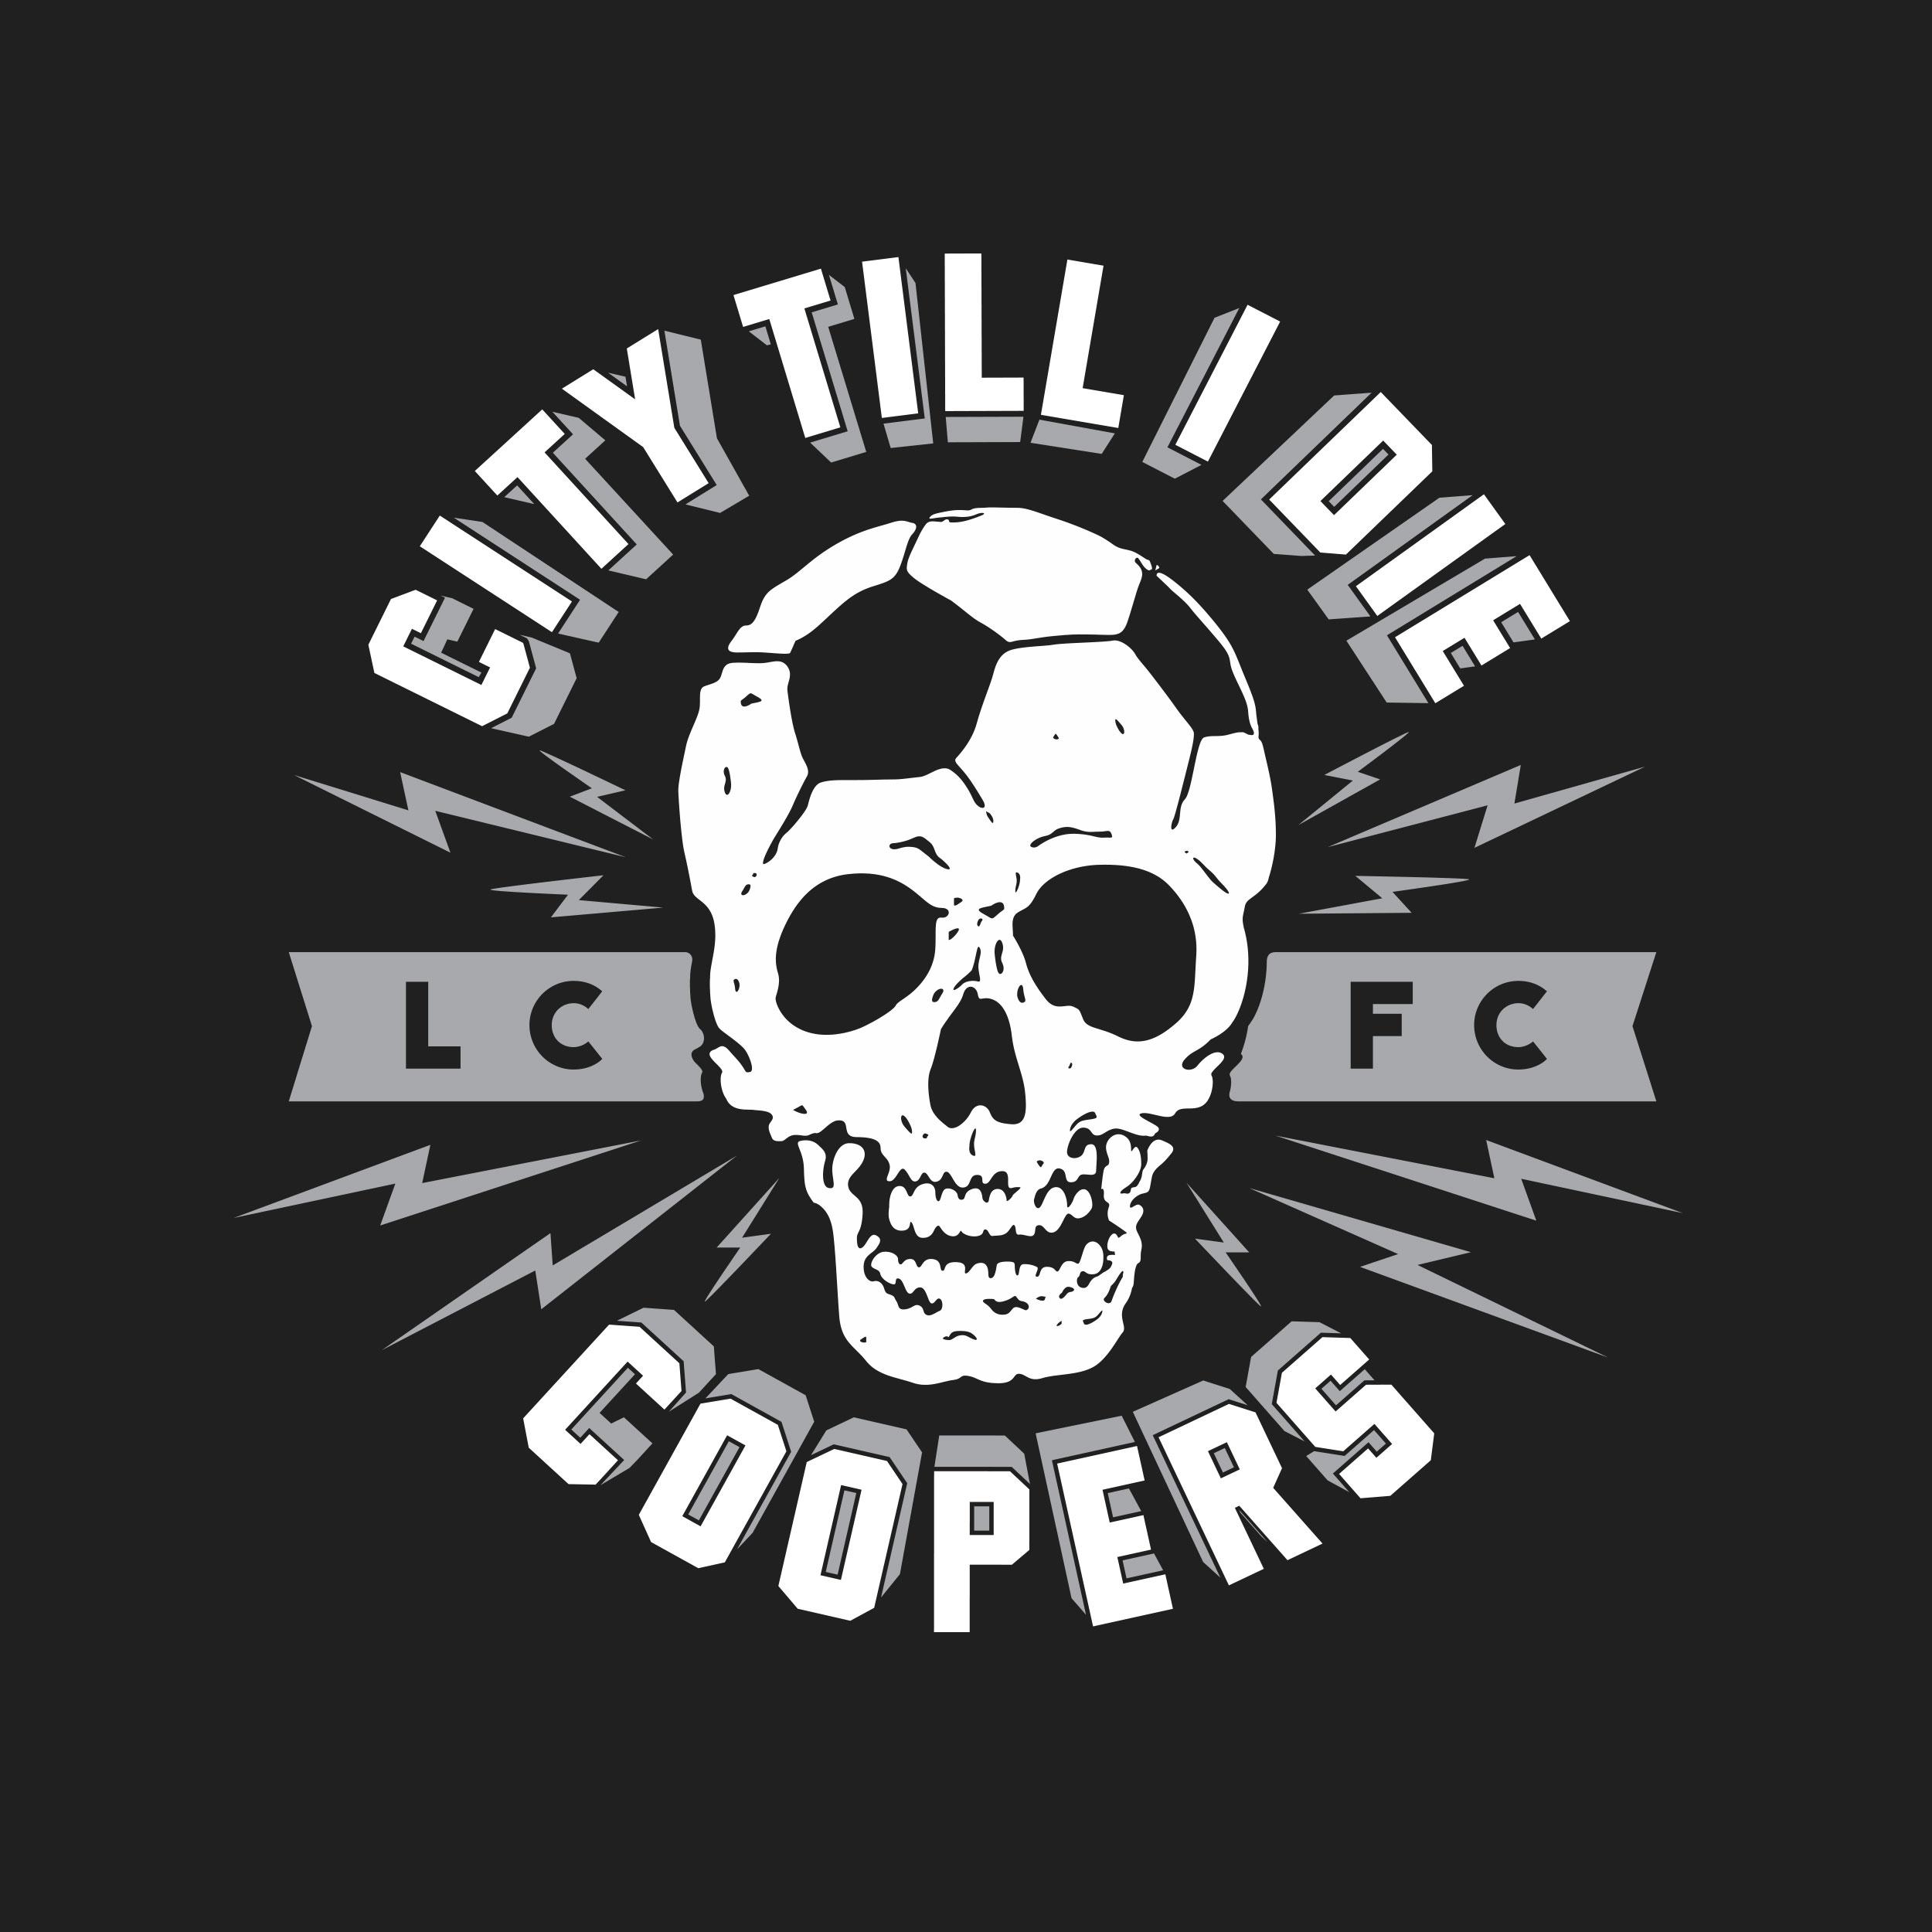 Coopers-02.jpg